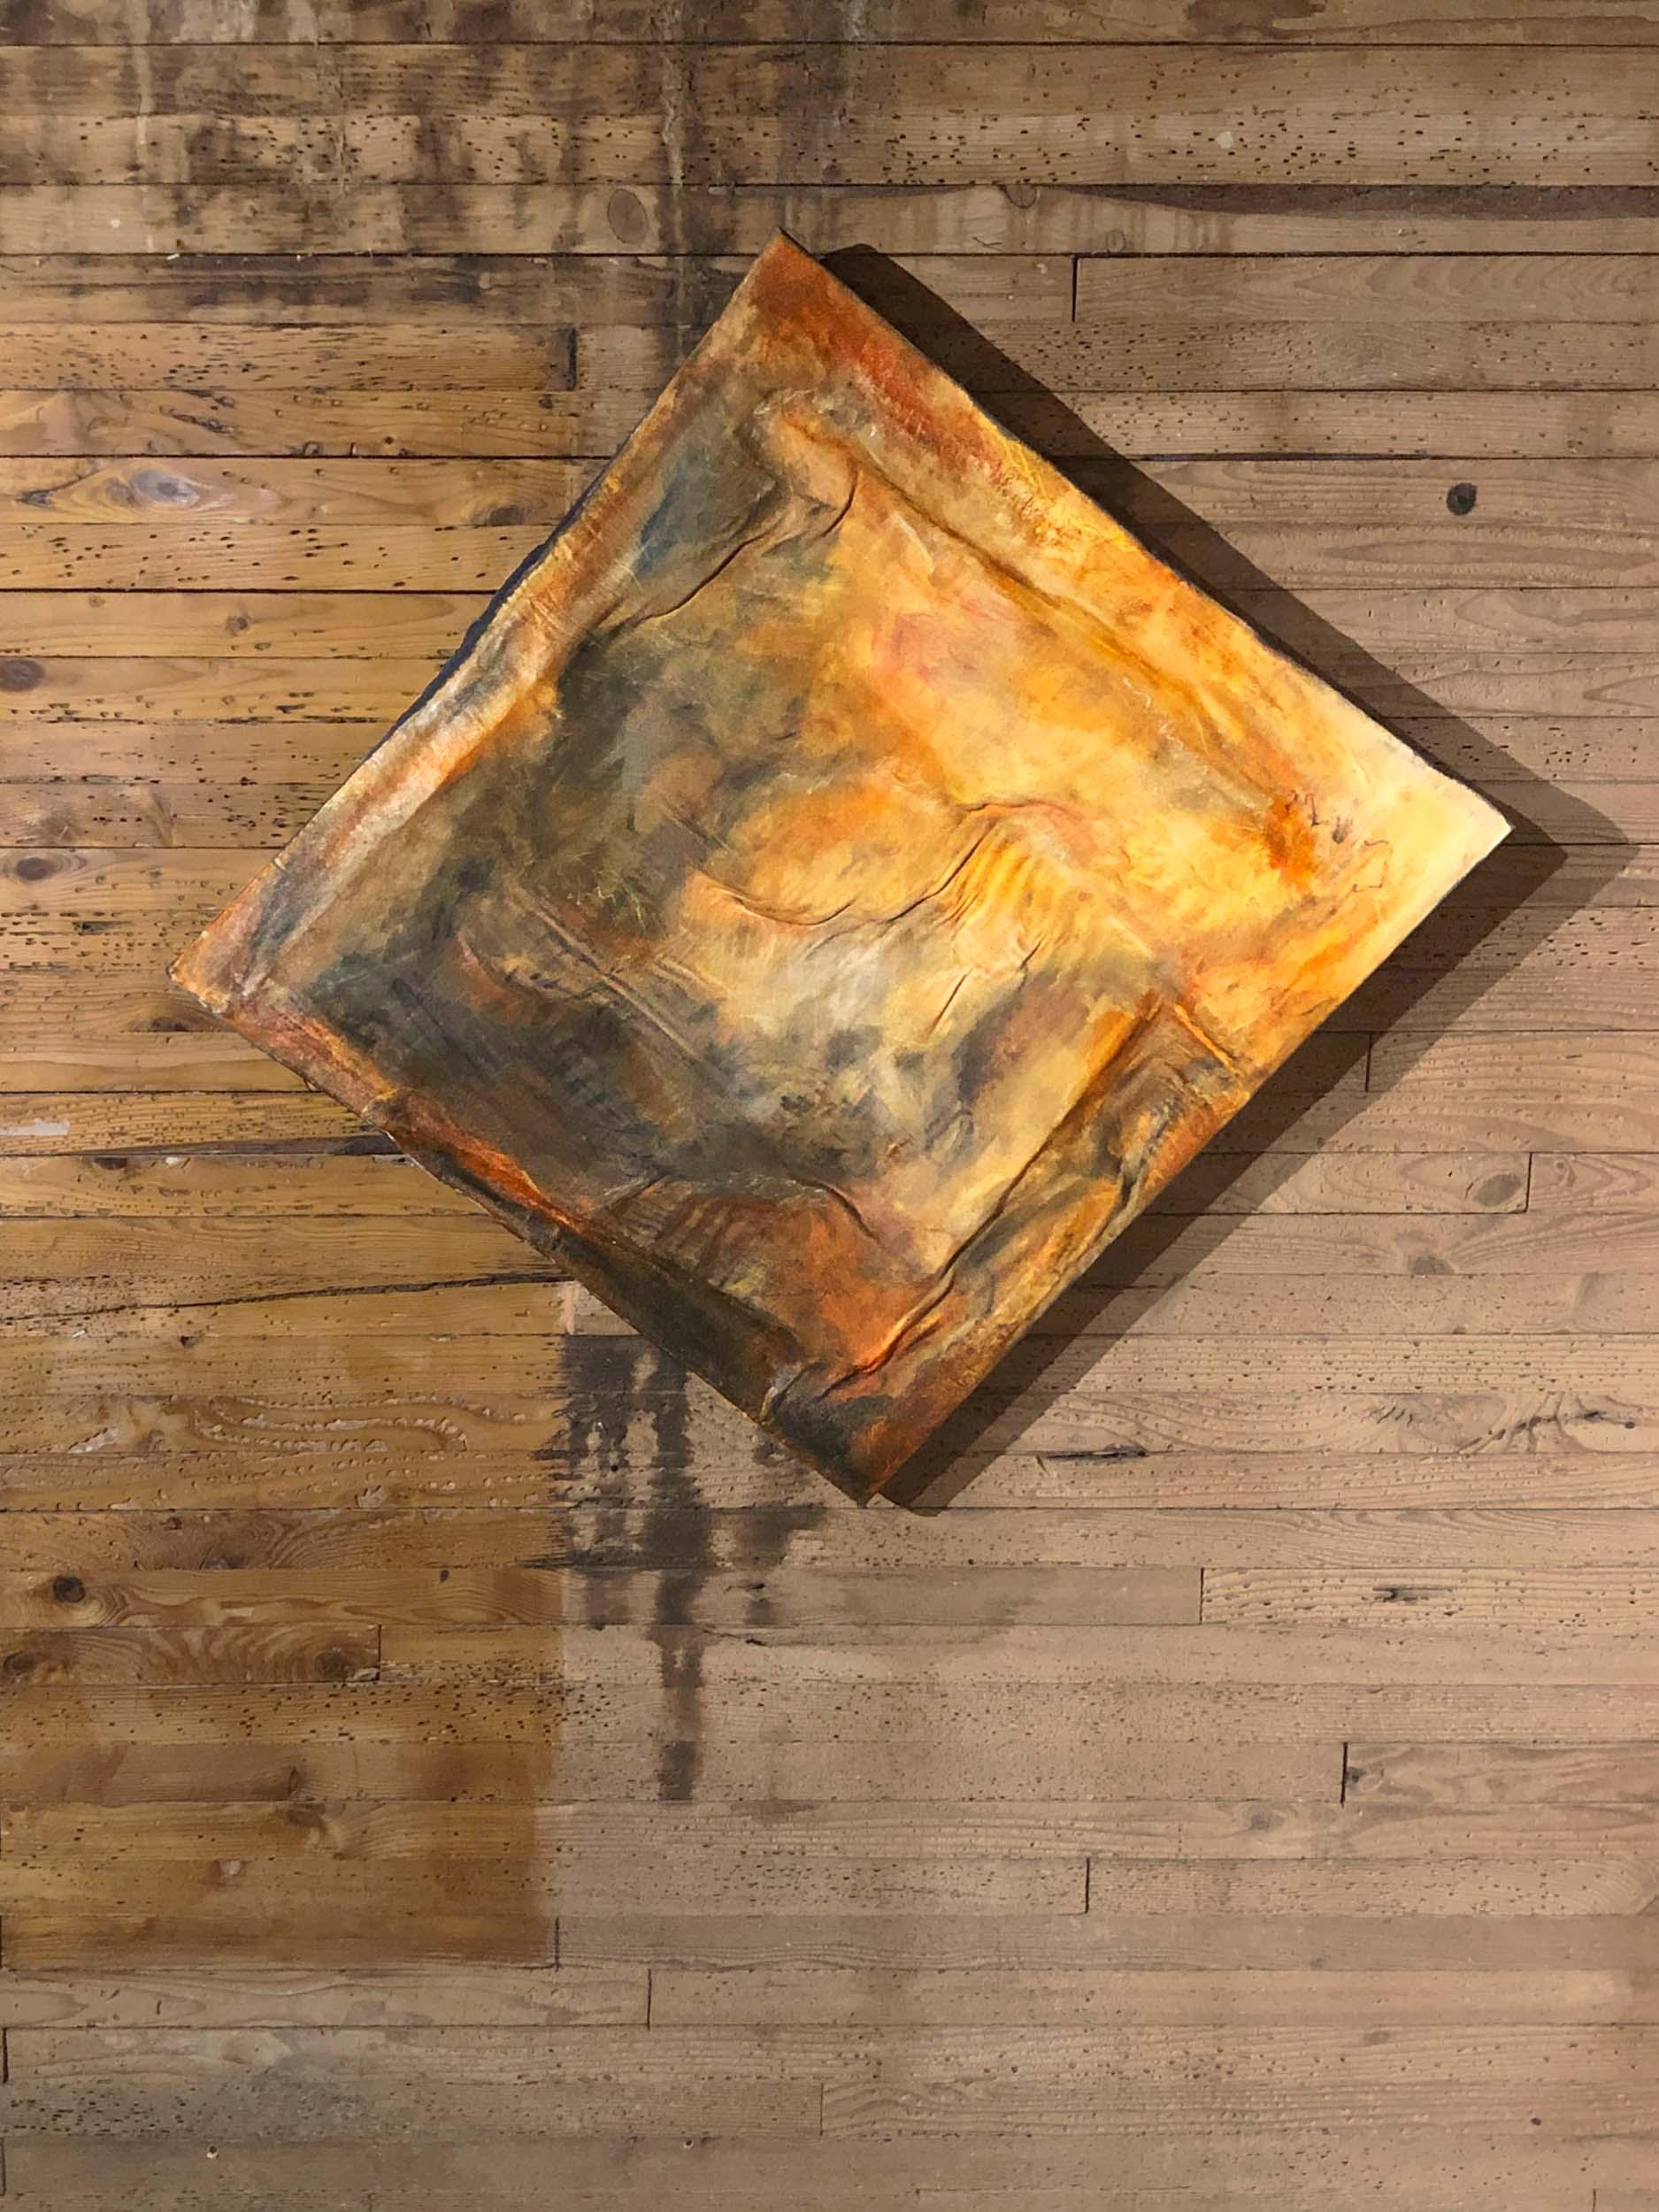 wassaic-project-artist-daniel-zeese-cube-moon-2019-01-06-20-44-36.jpg